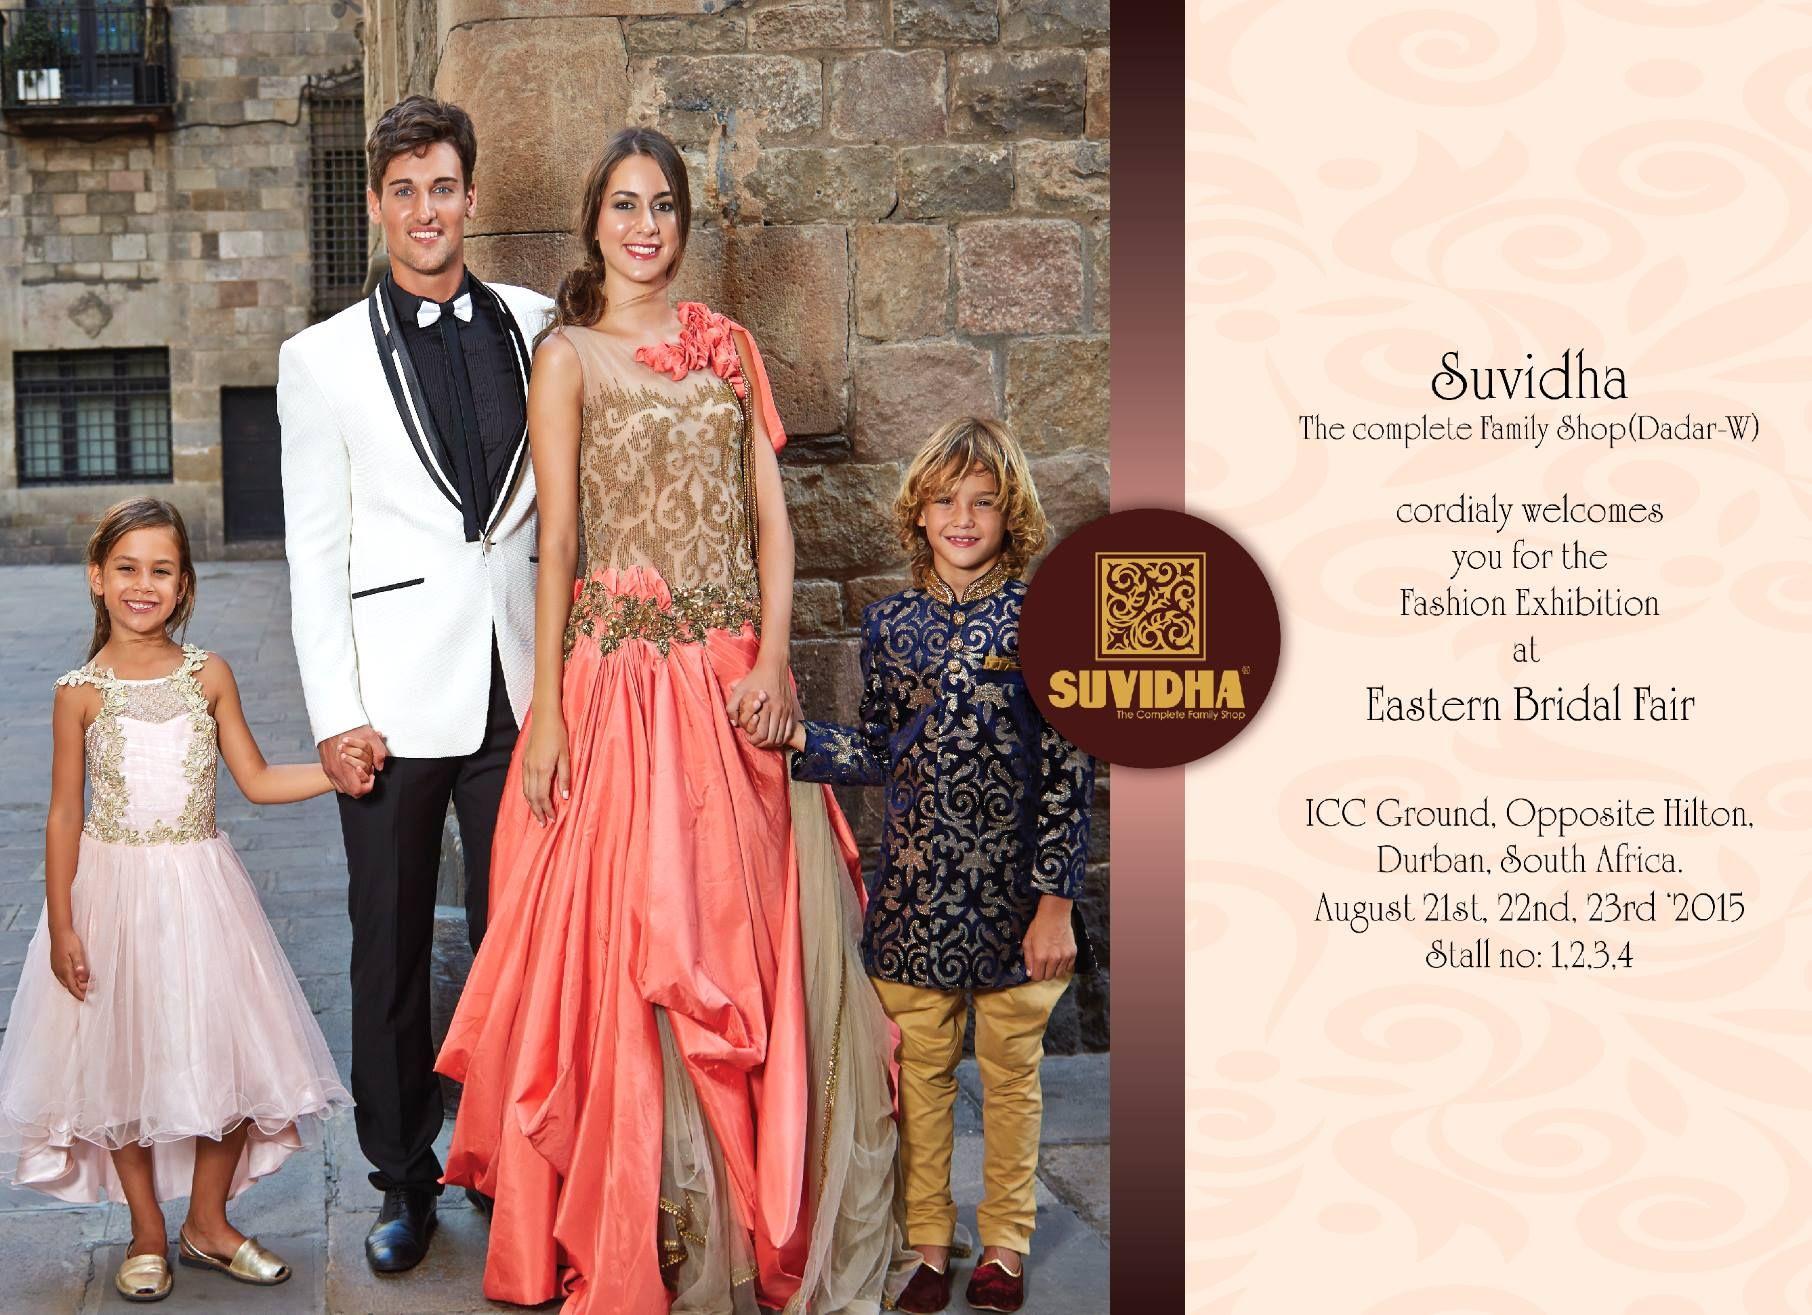 Bridesmaid Dresses South Africa Durban